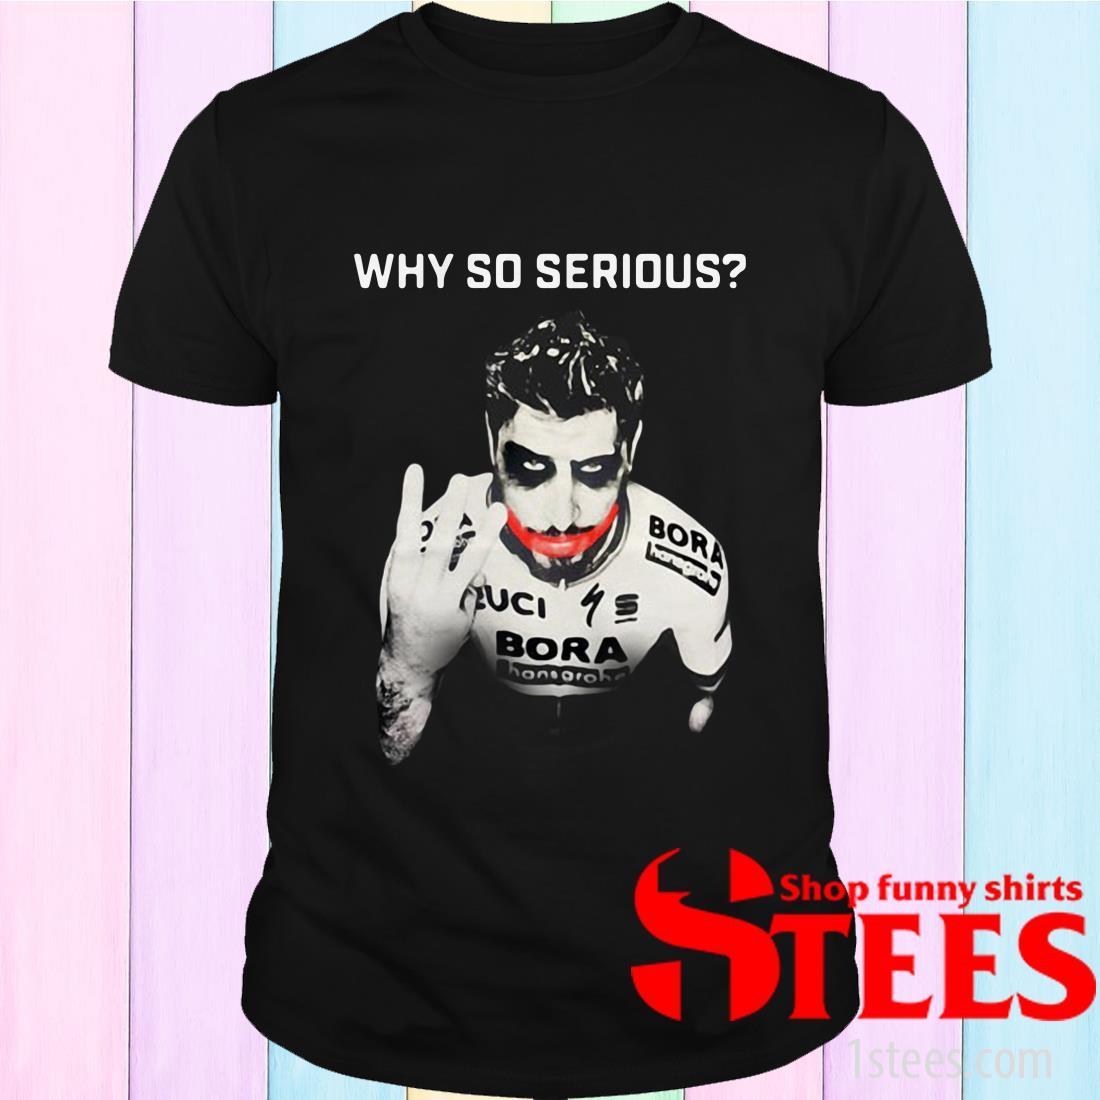 Peter Sagan Joker Why So Serious Shirt